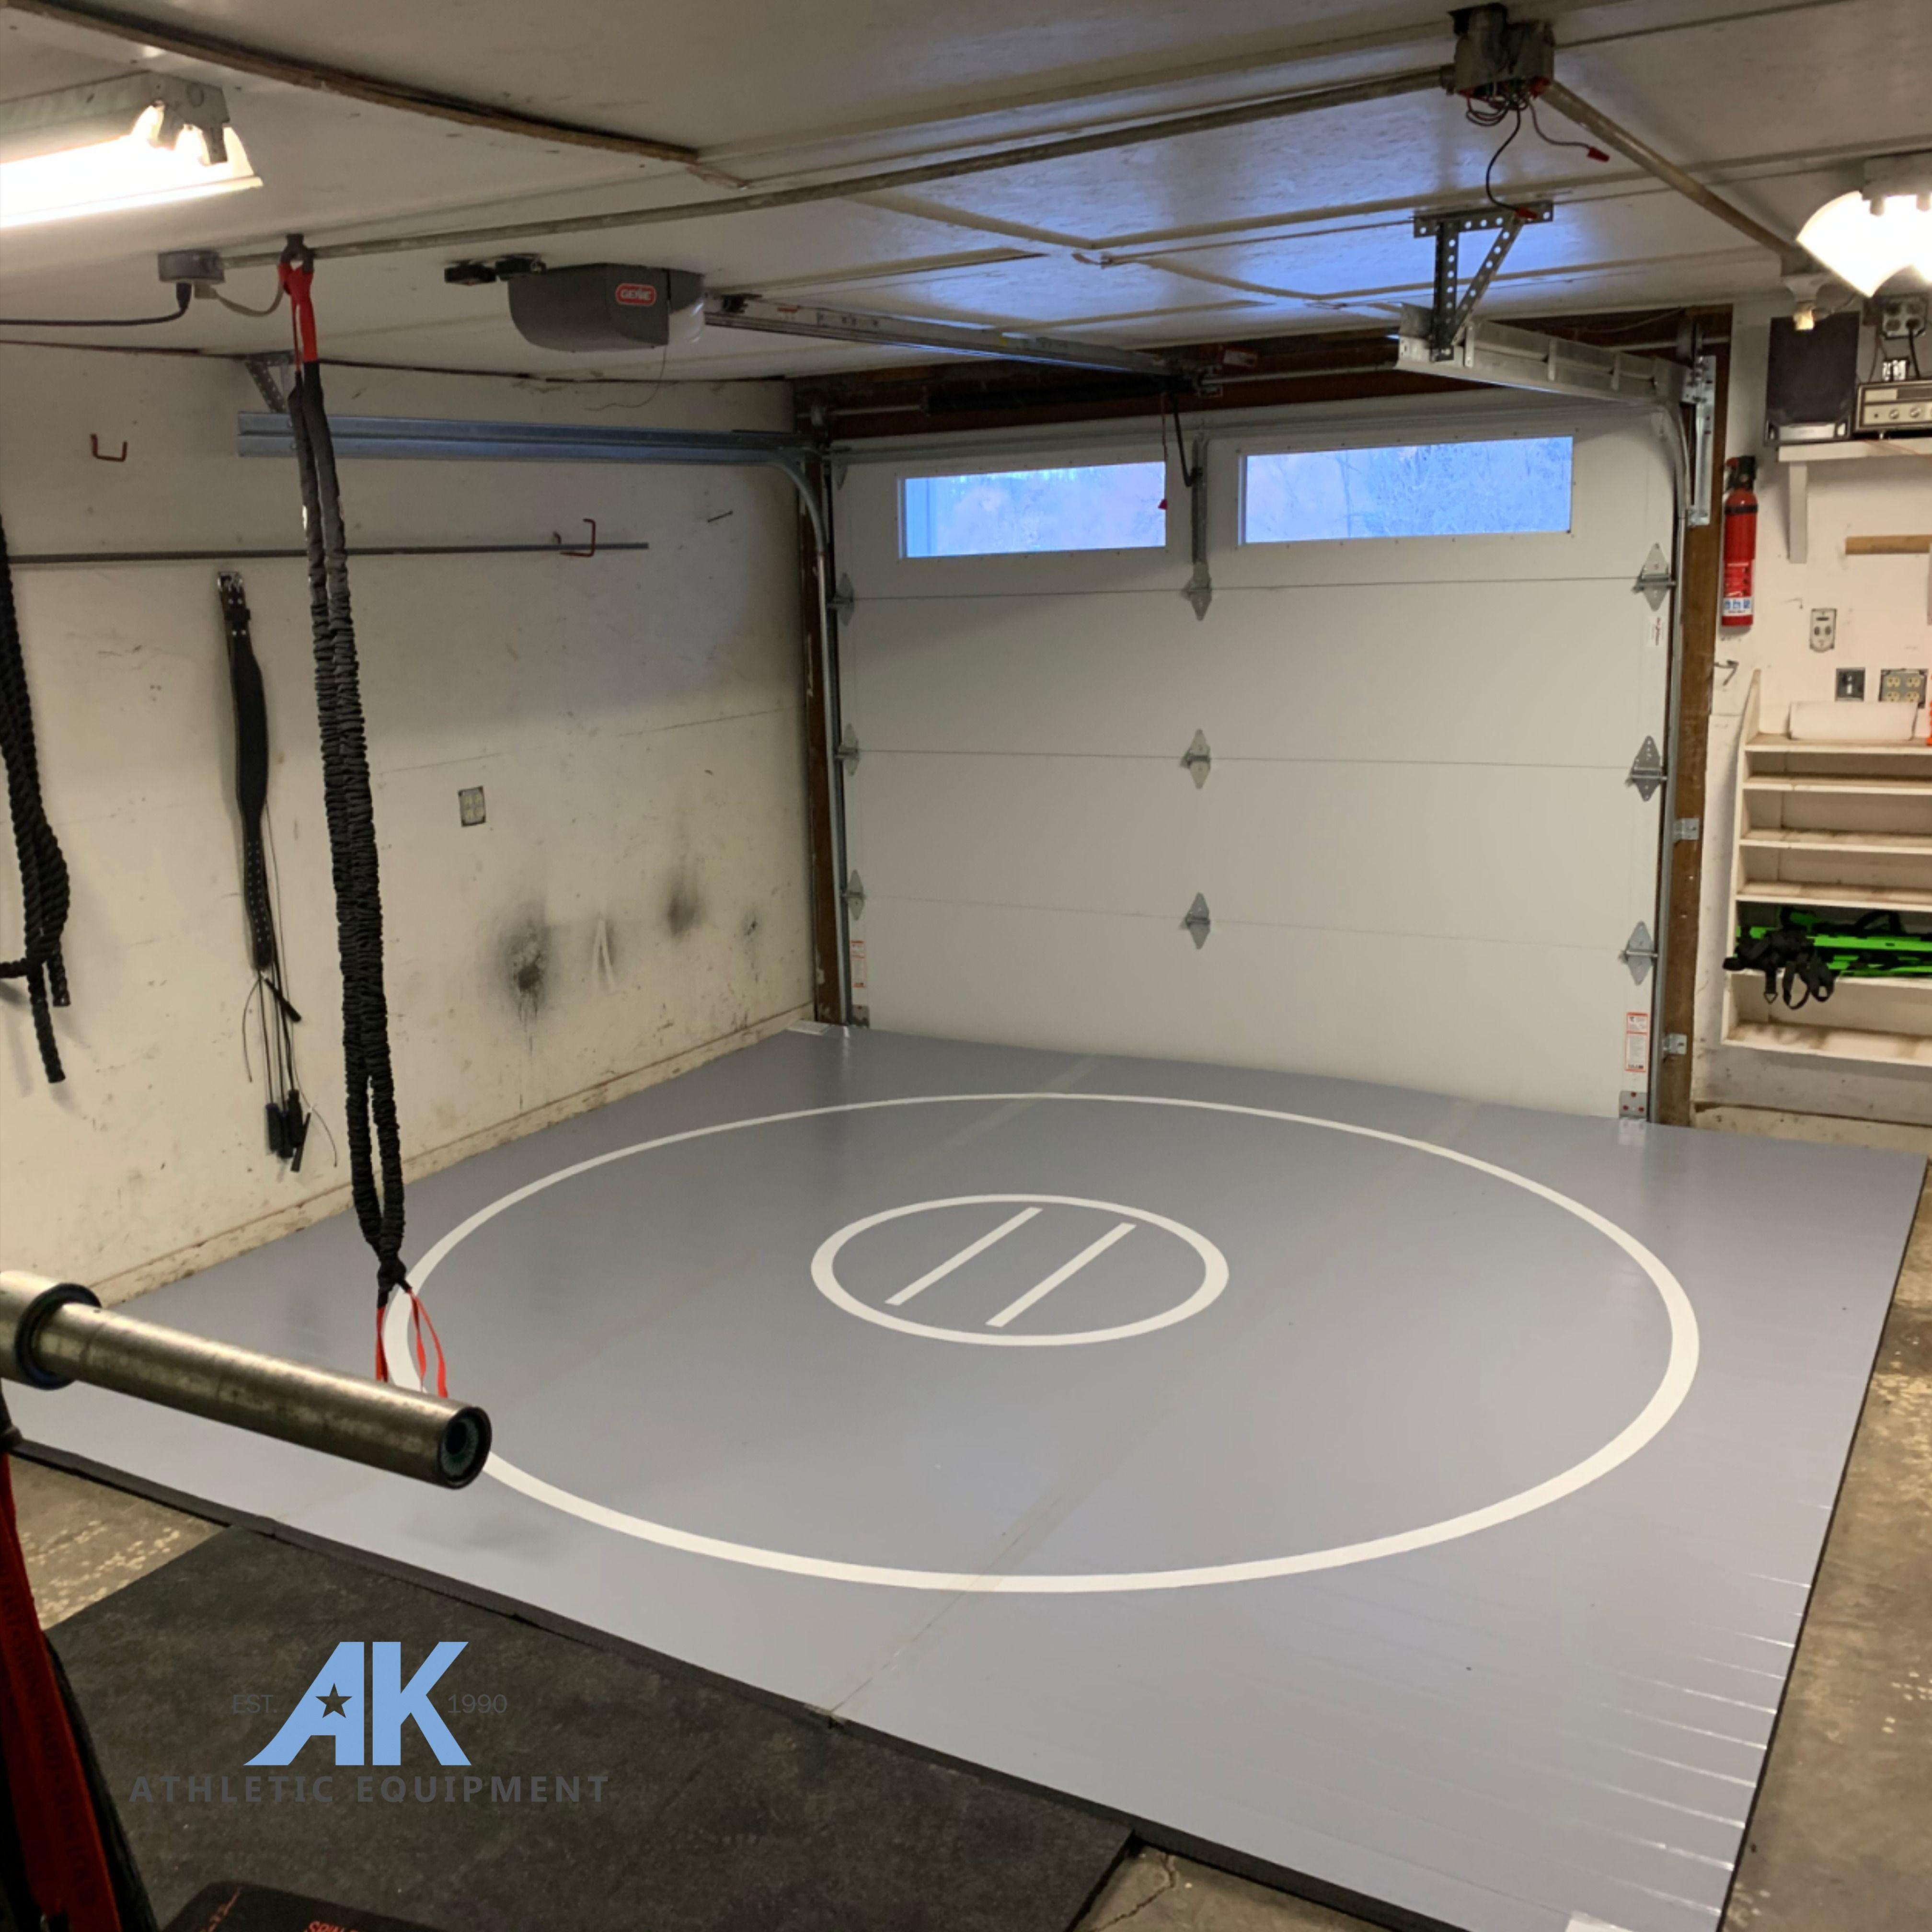 12 X 12 X 1 3 8 Roll Up Wrestling Mat In 2020 Garage Gym Mma Gym Jiu Jitsu Mats